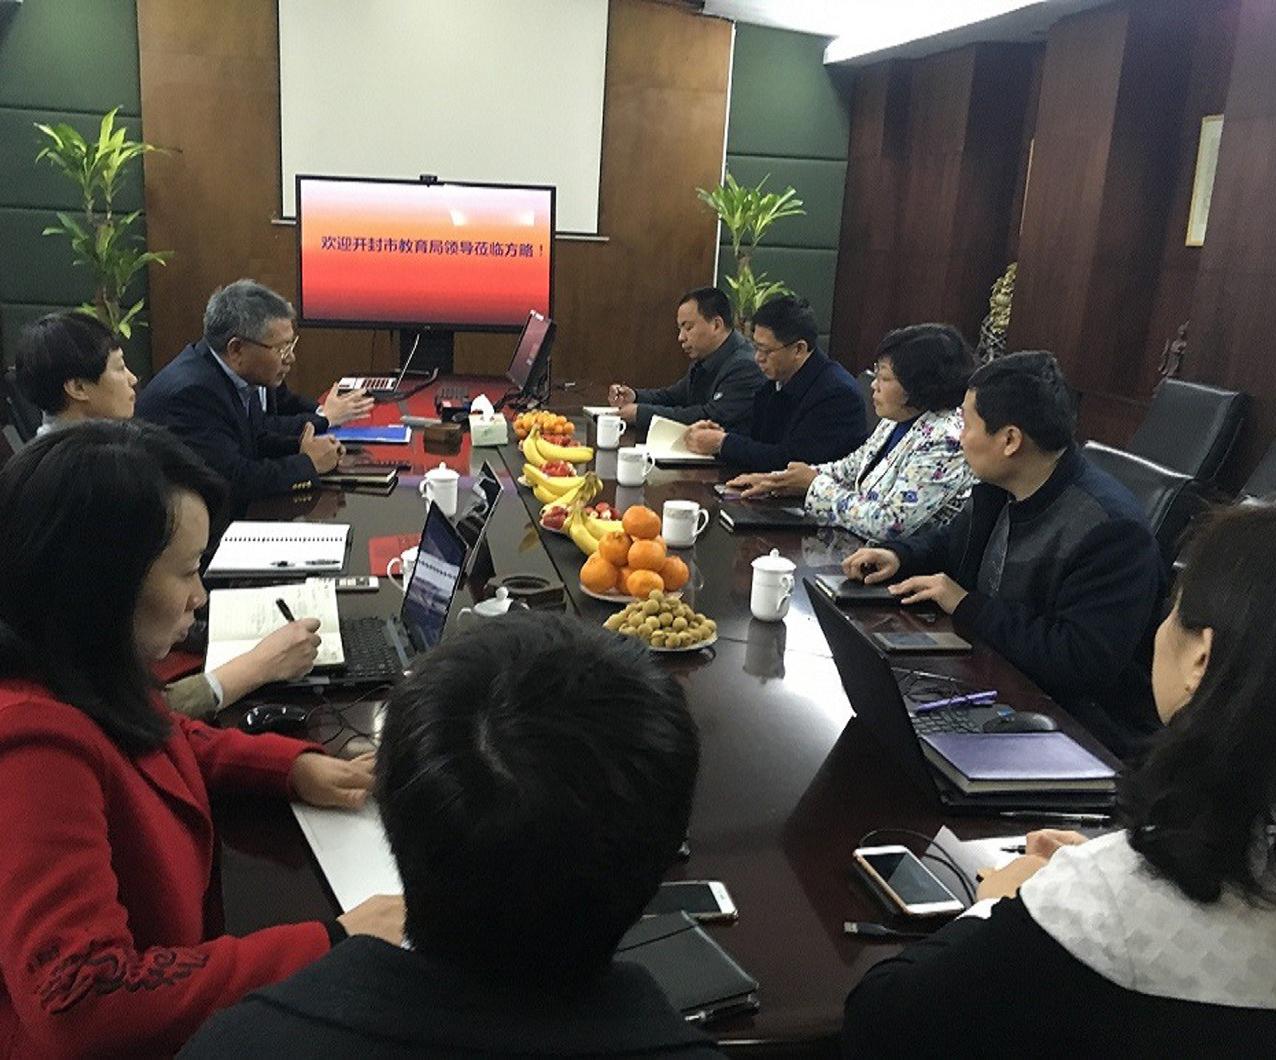 7 news kaifeng 3 - 开封市政府副秘书长一行来沪考察方略